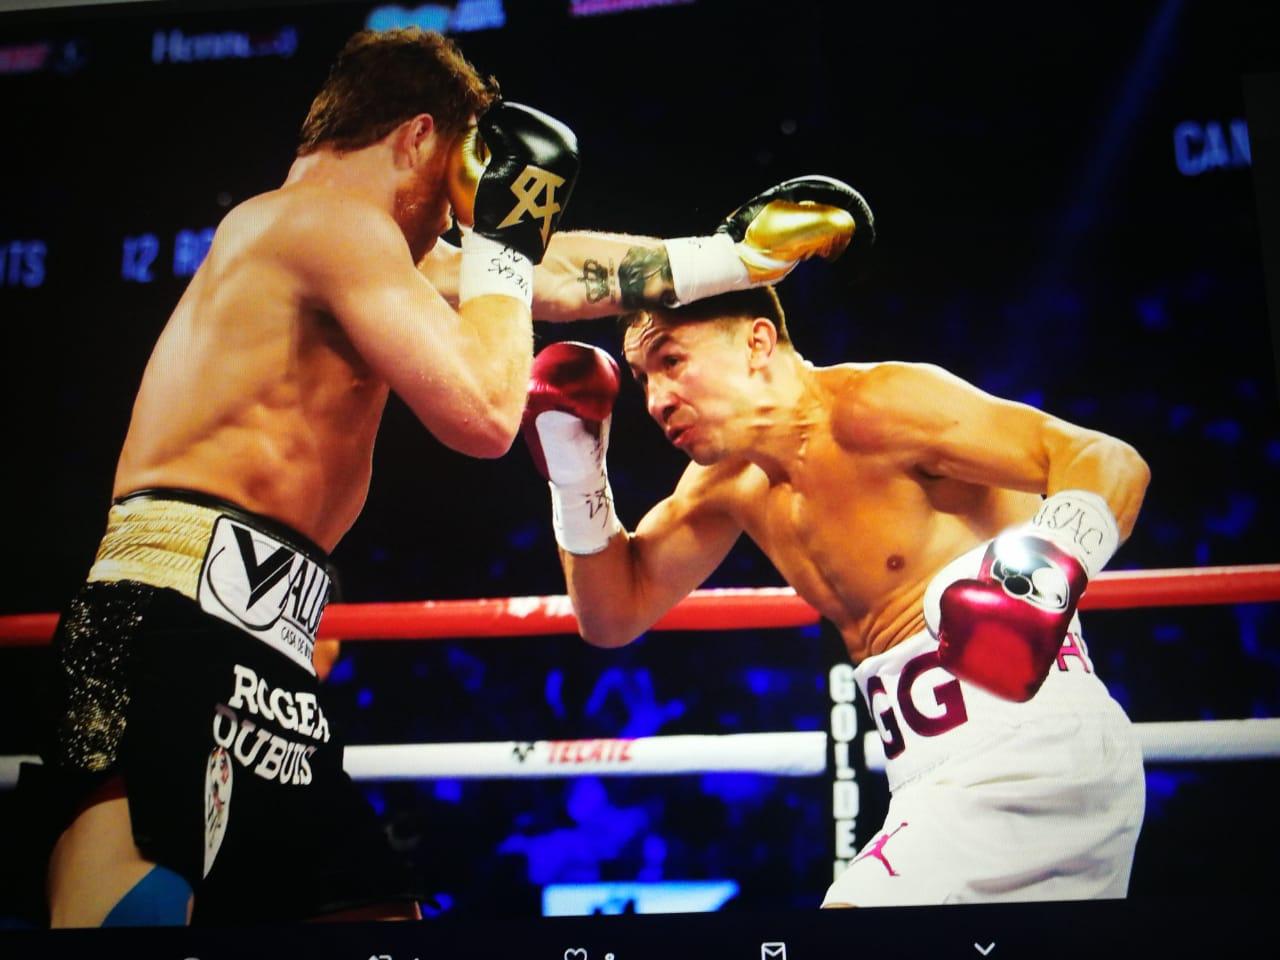 Saúl 'Canelo' Álvarez vence a Golovkin en una 'apretada' pelea